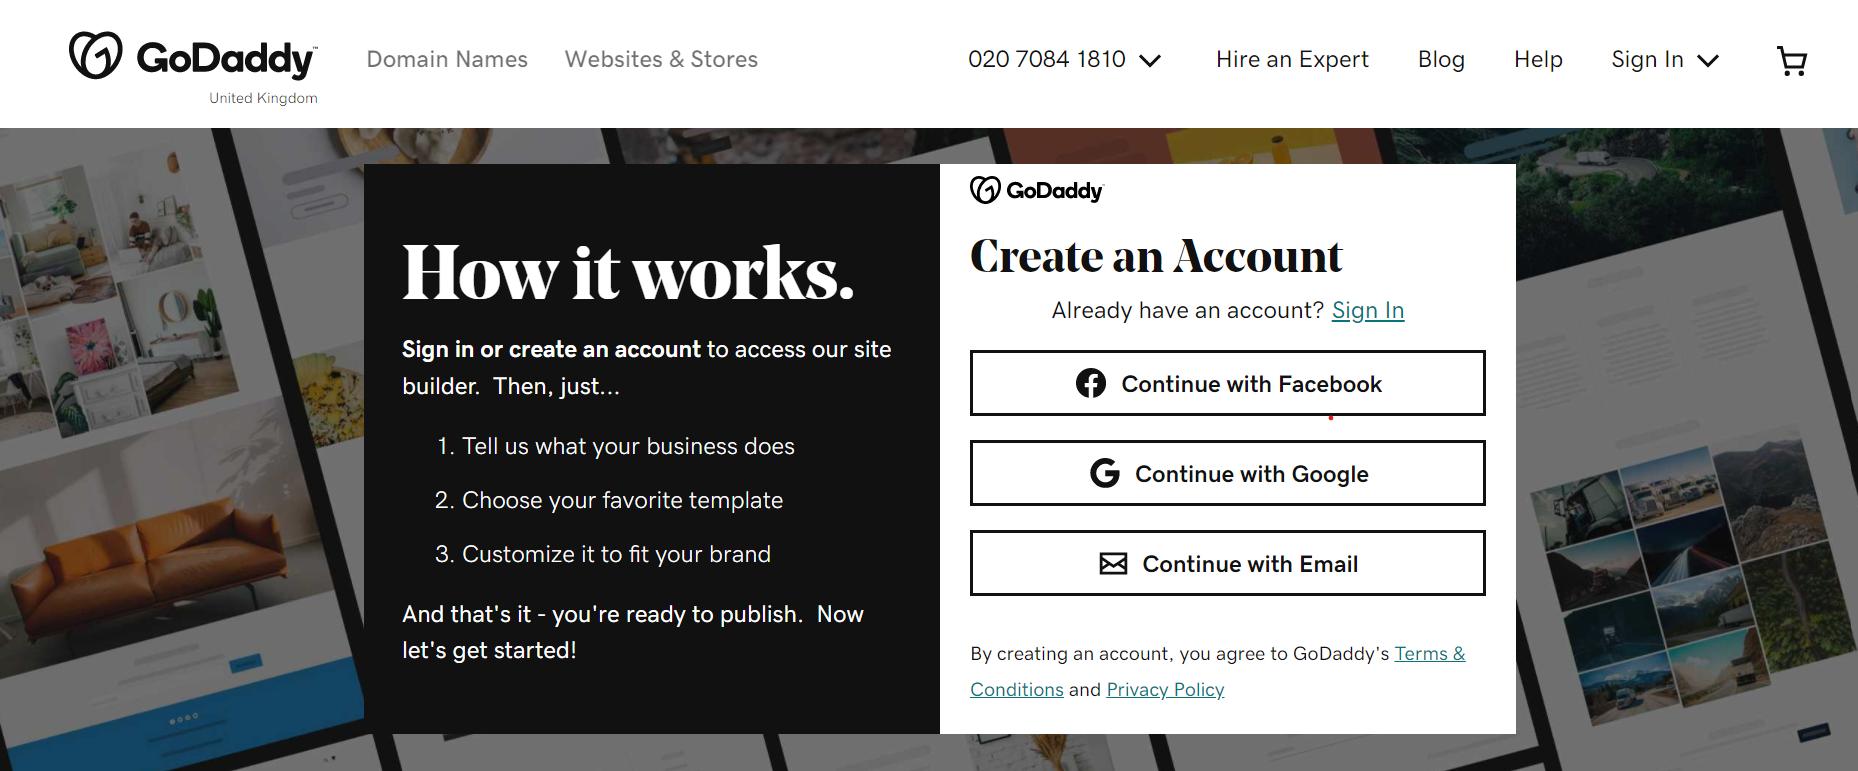 GoDaddy Website Builder in India